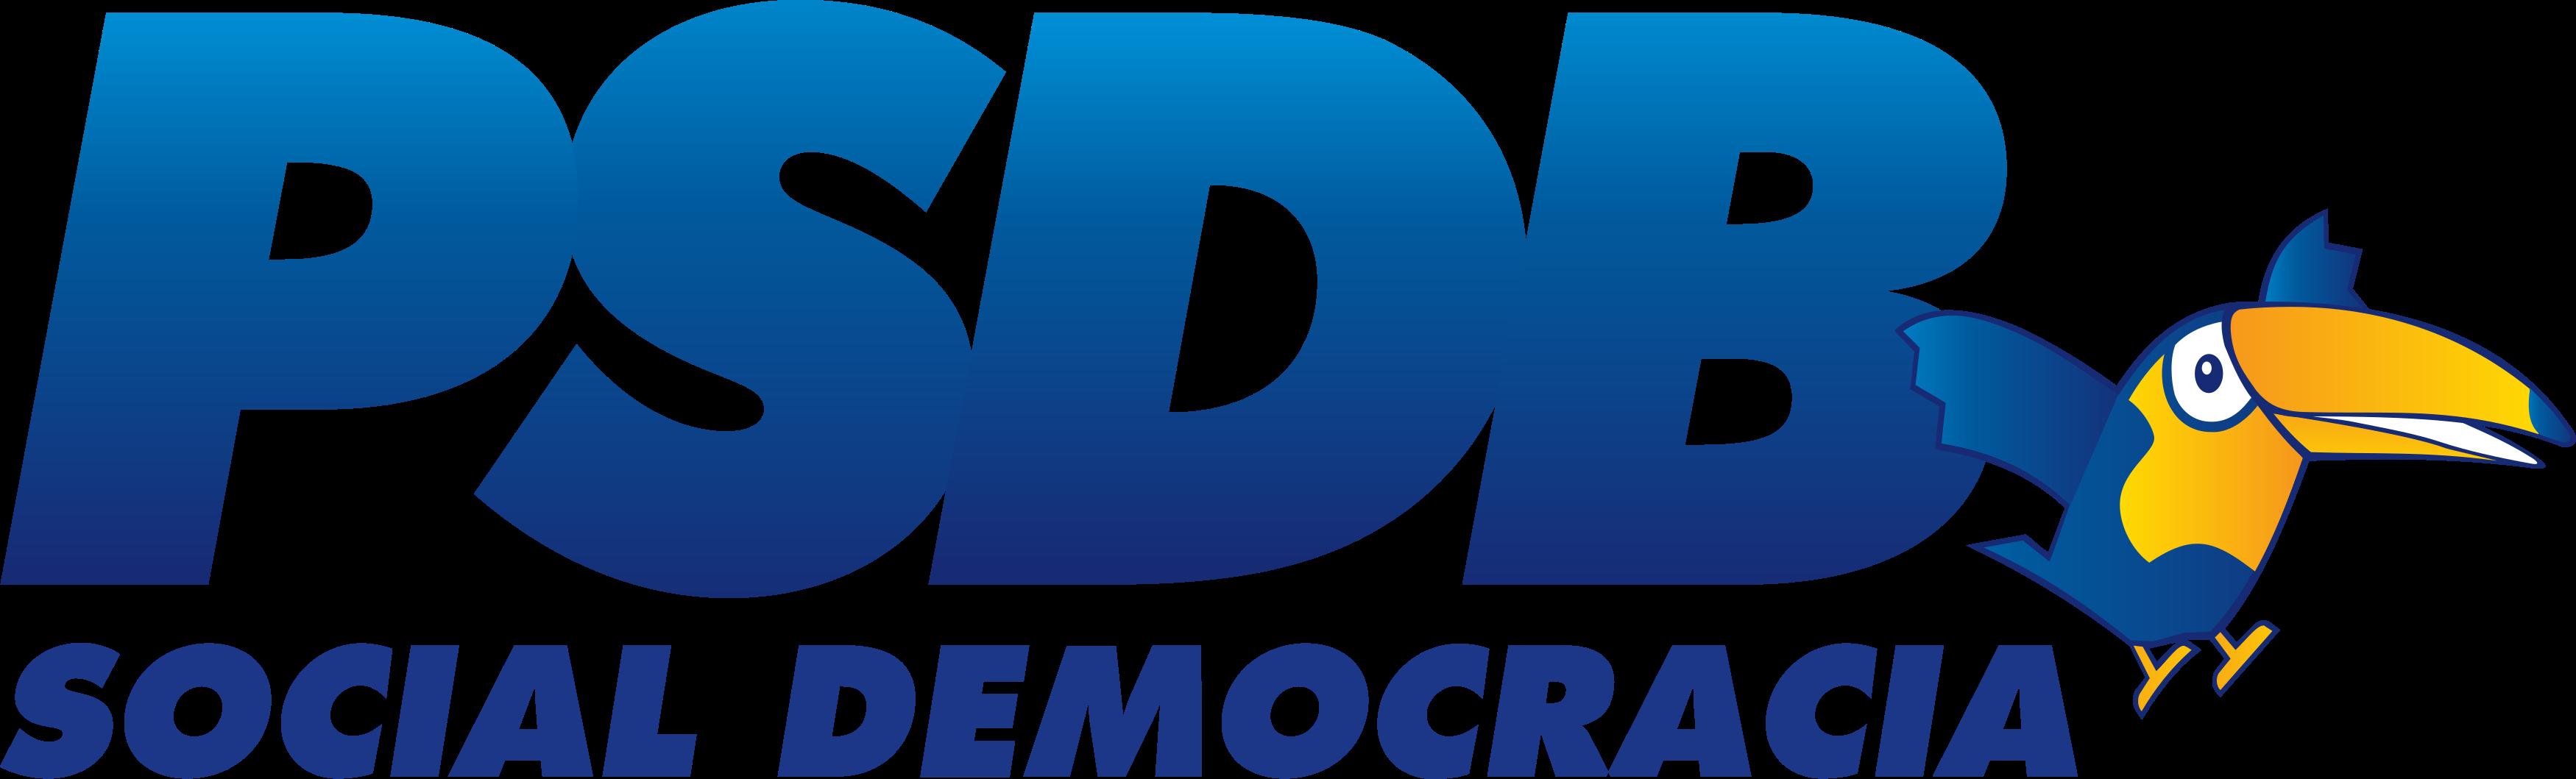 PSDB Logo.